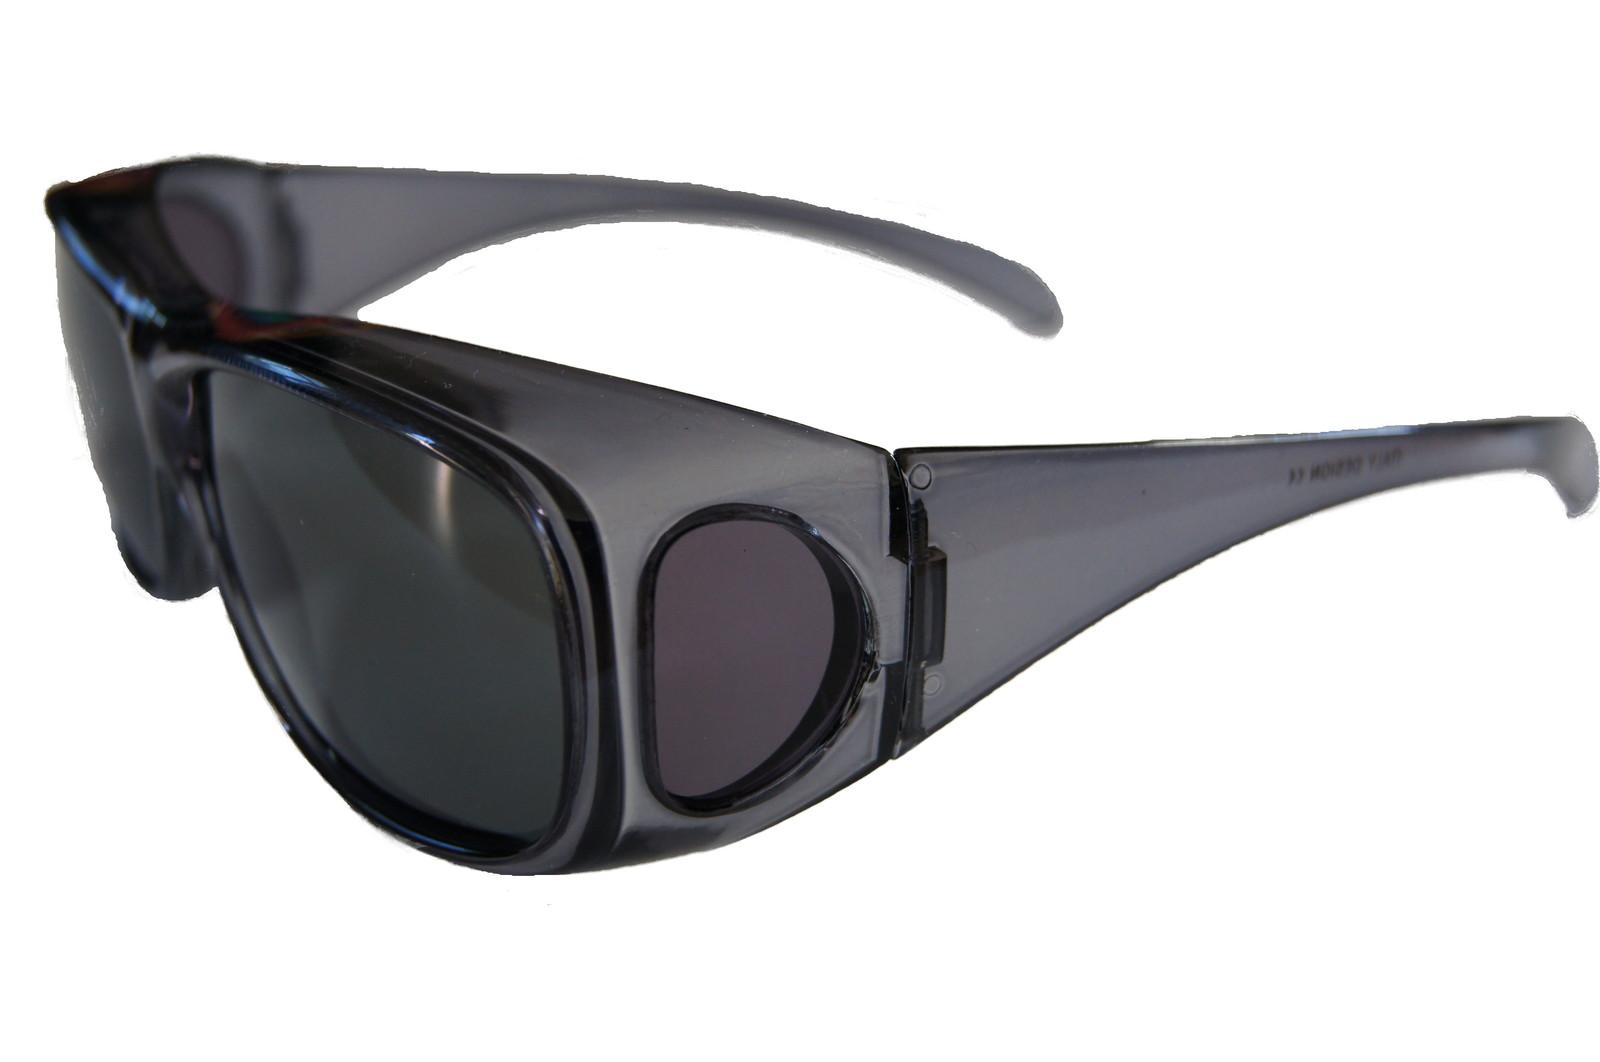 1378edcd273 Prescription Glasses With Bifocals